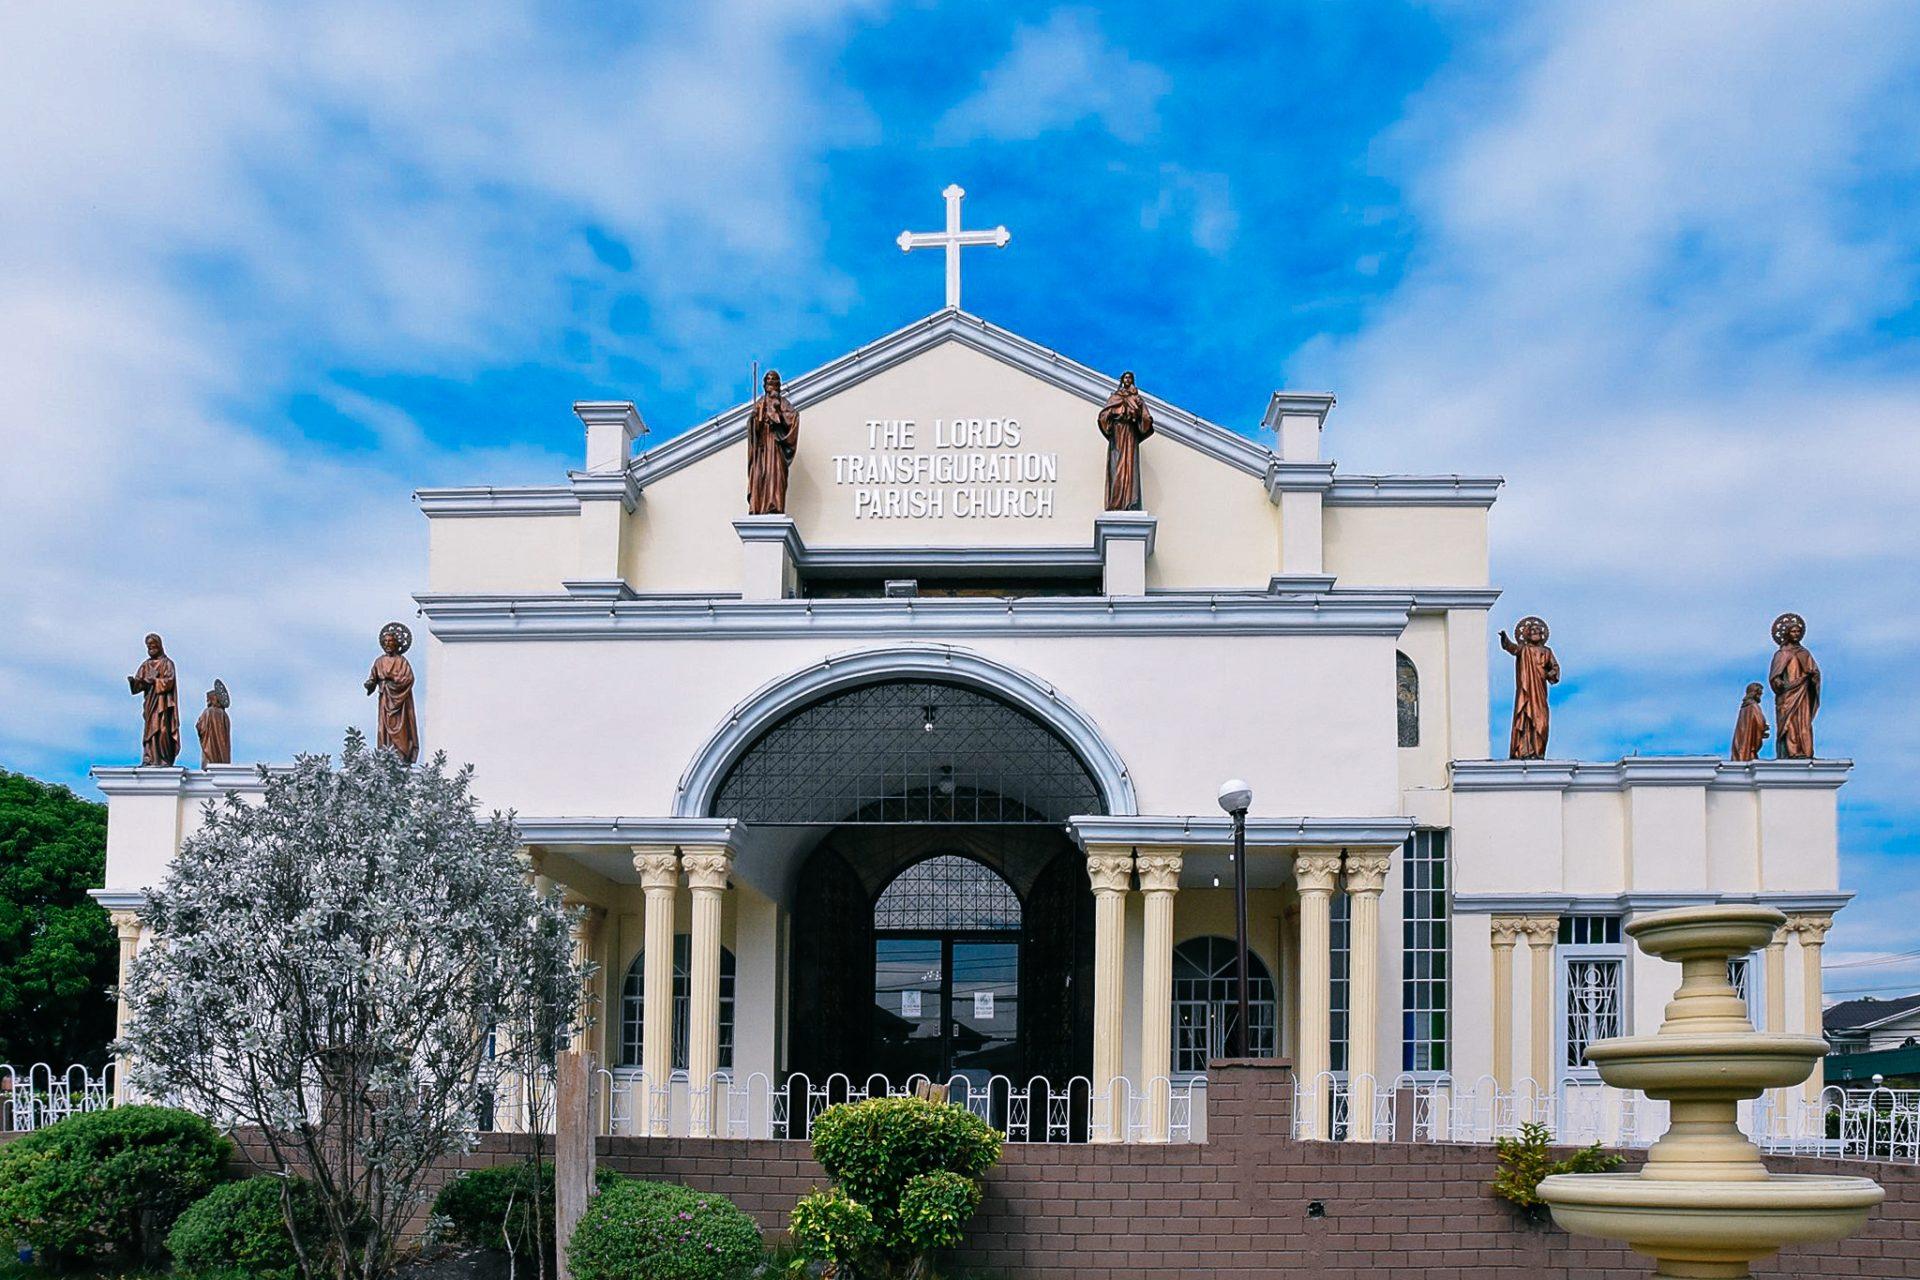 The Lord's Transfiguration Parish